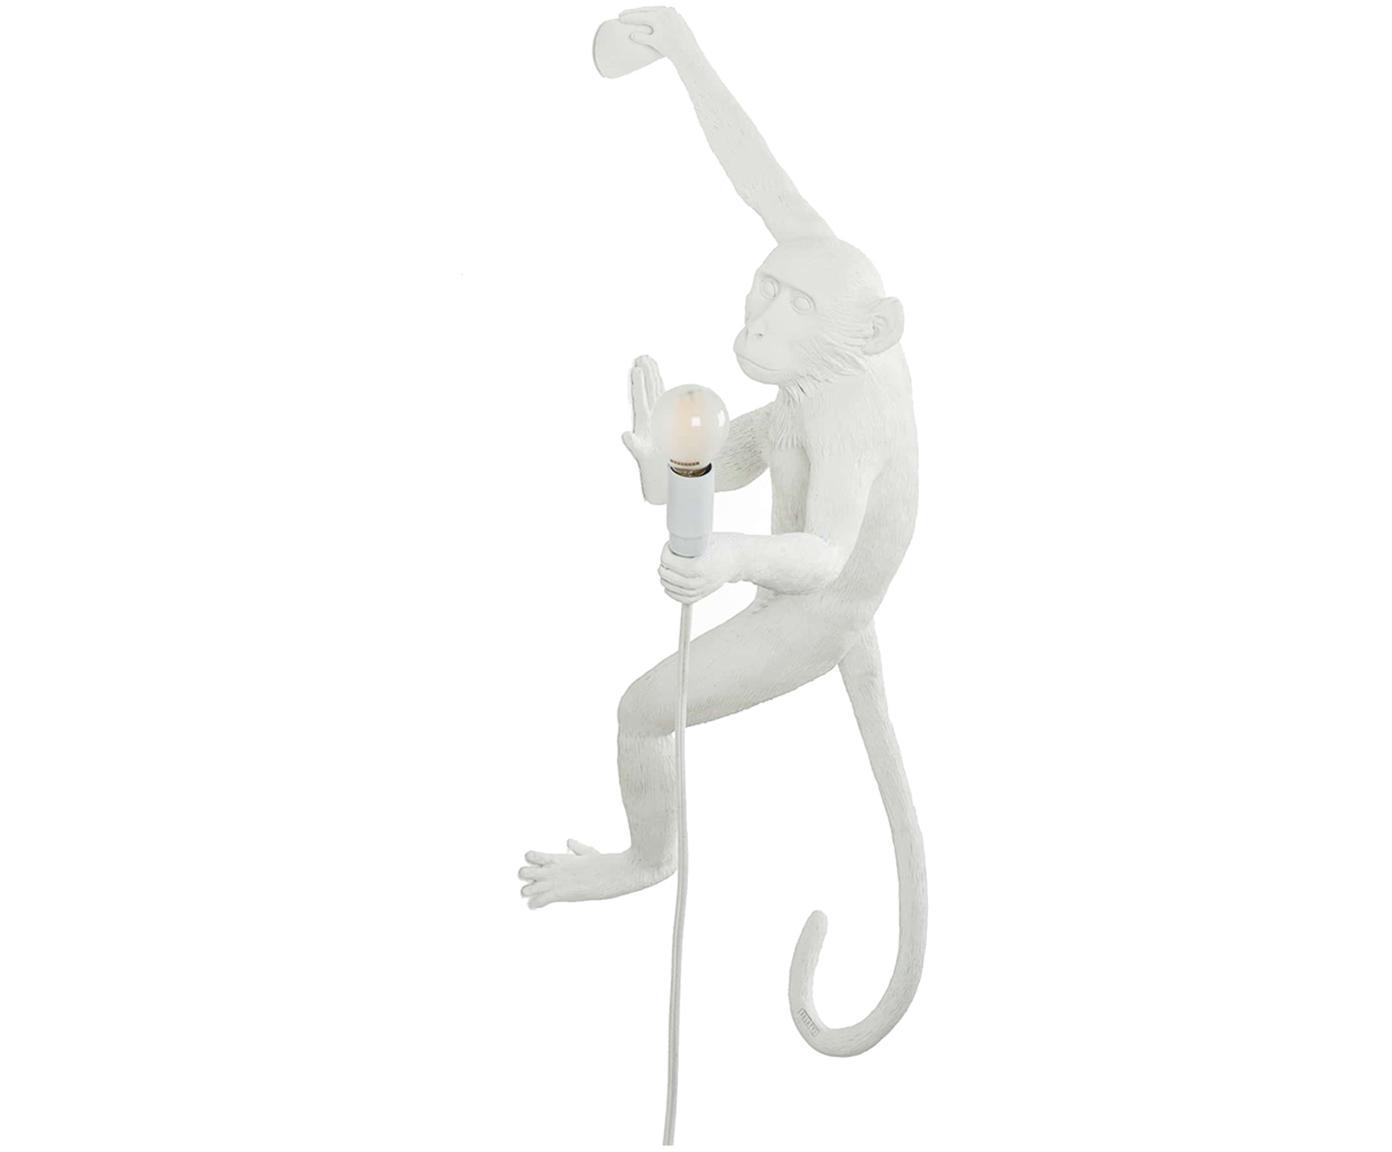 Applique con spina The Monkey, Poliresina, Bianco, Larg. 21 x Alt. 77 cm